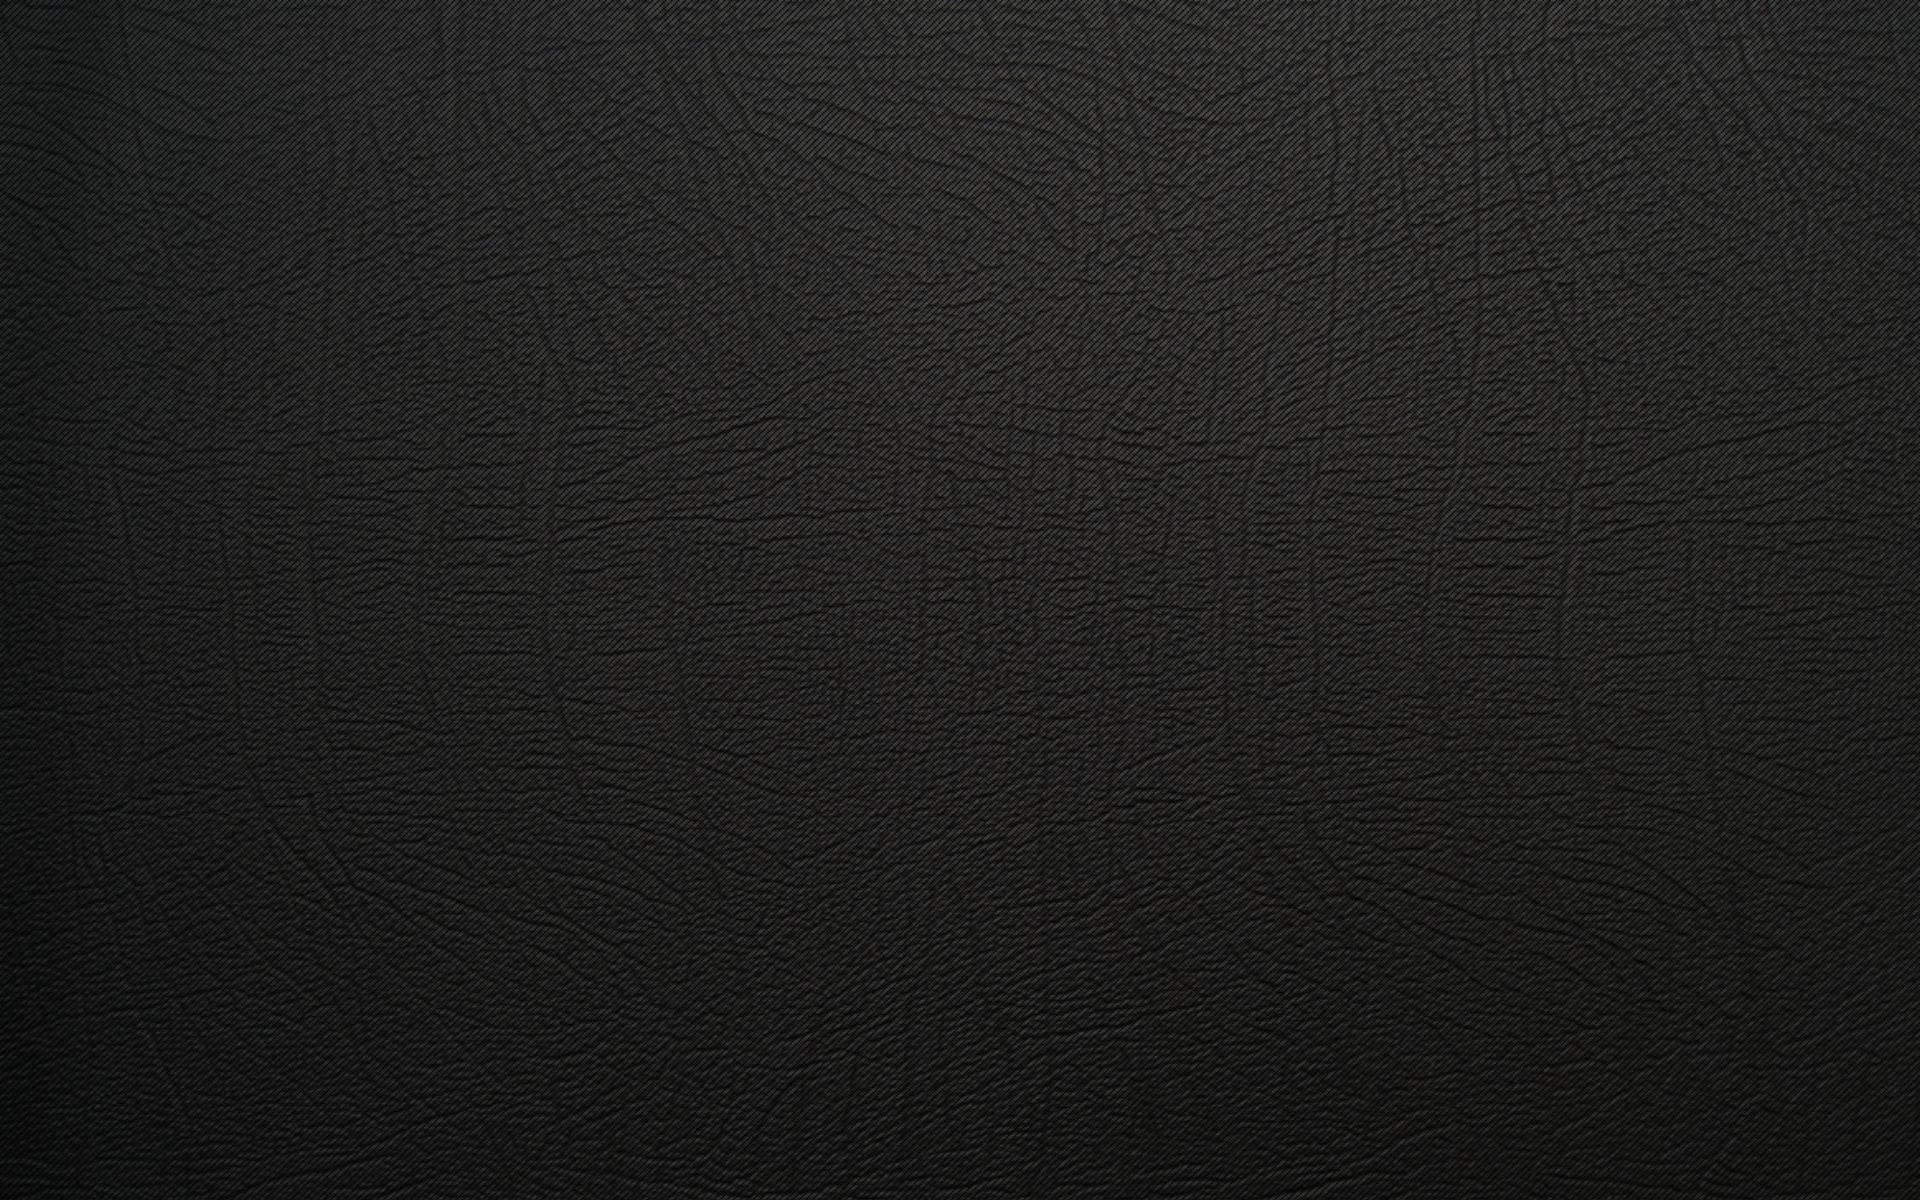 black texture for cowboy hat Top grain leather sofa